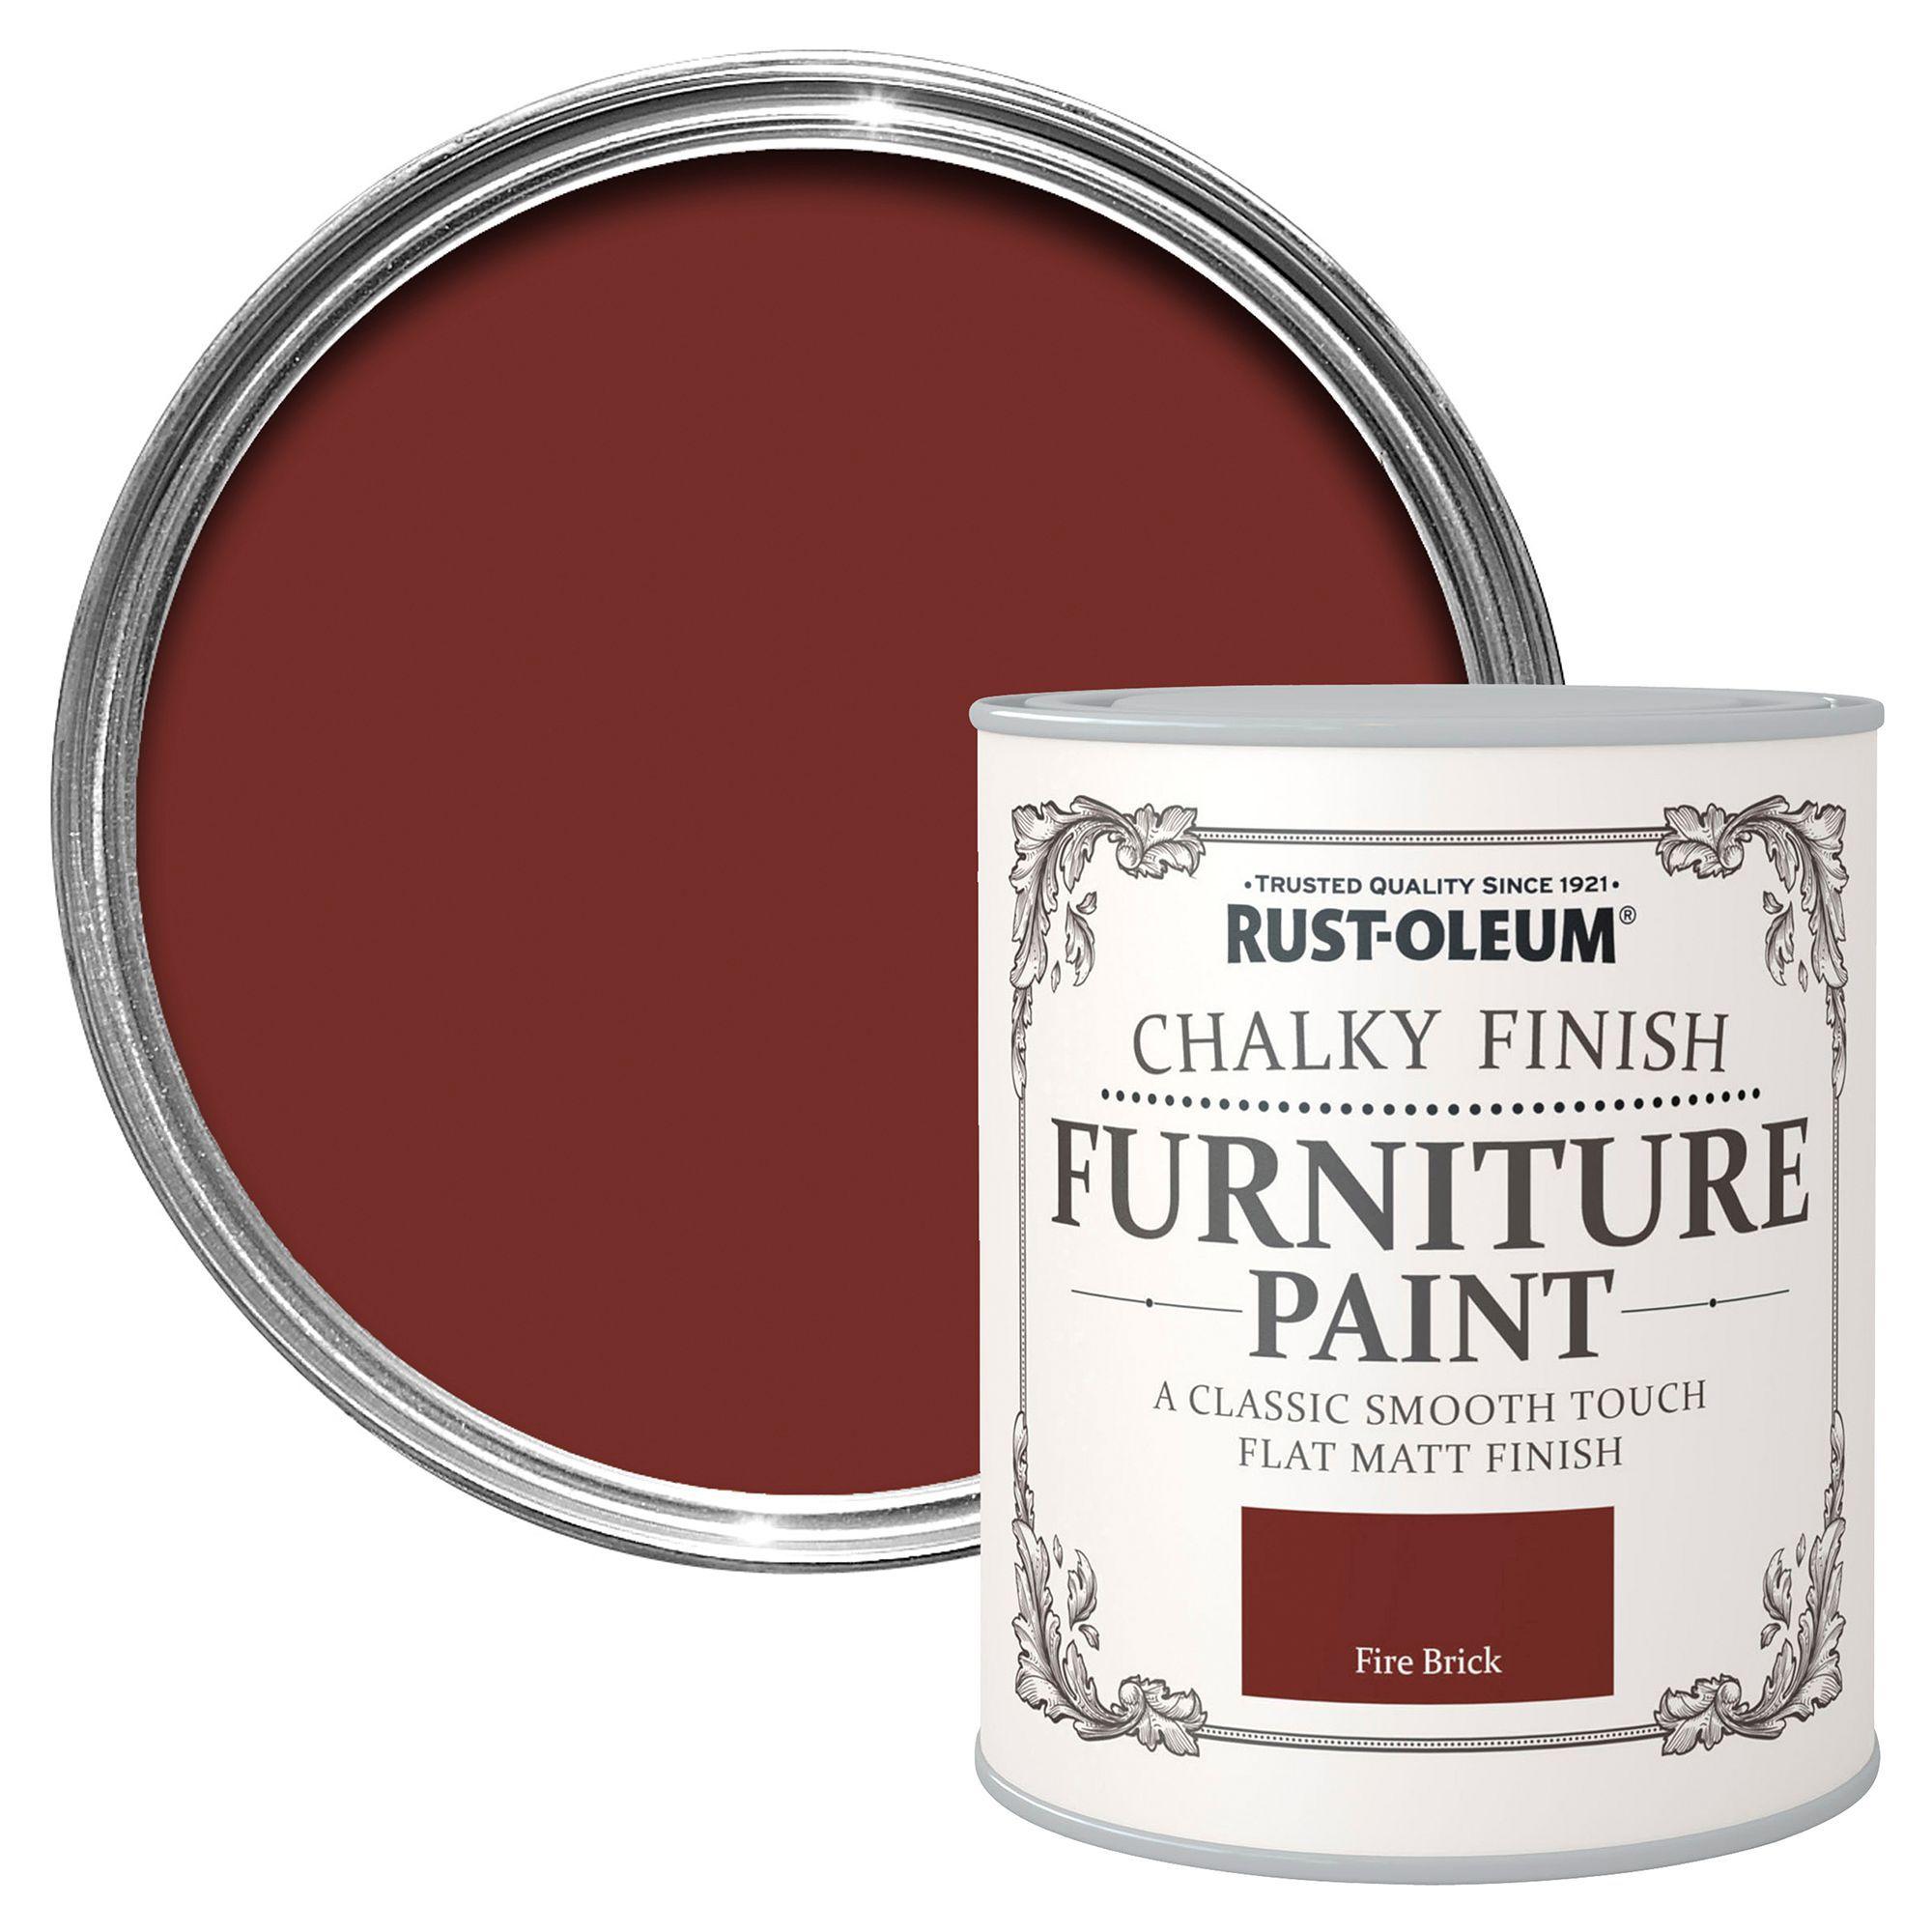 Rust-oleum Rust-oleum Fire Brick Matt Furniture Paint 750 Ml